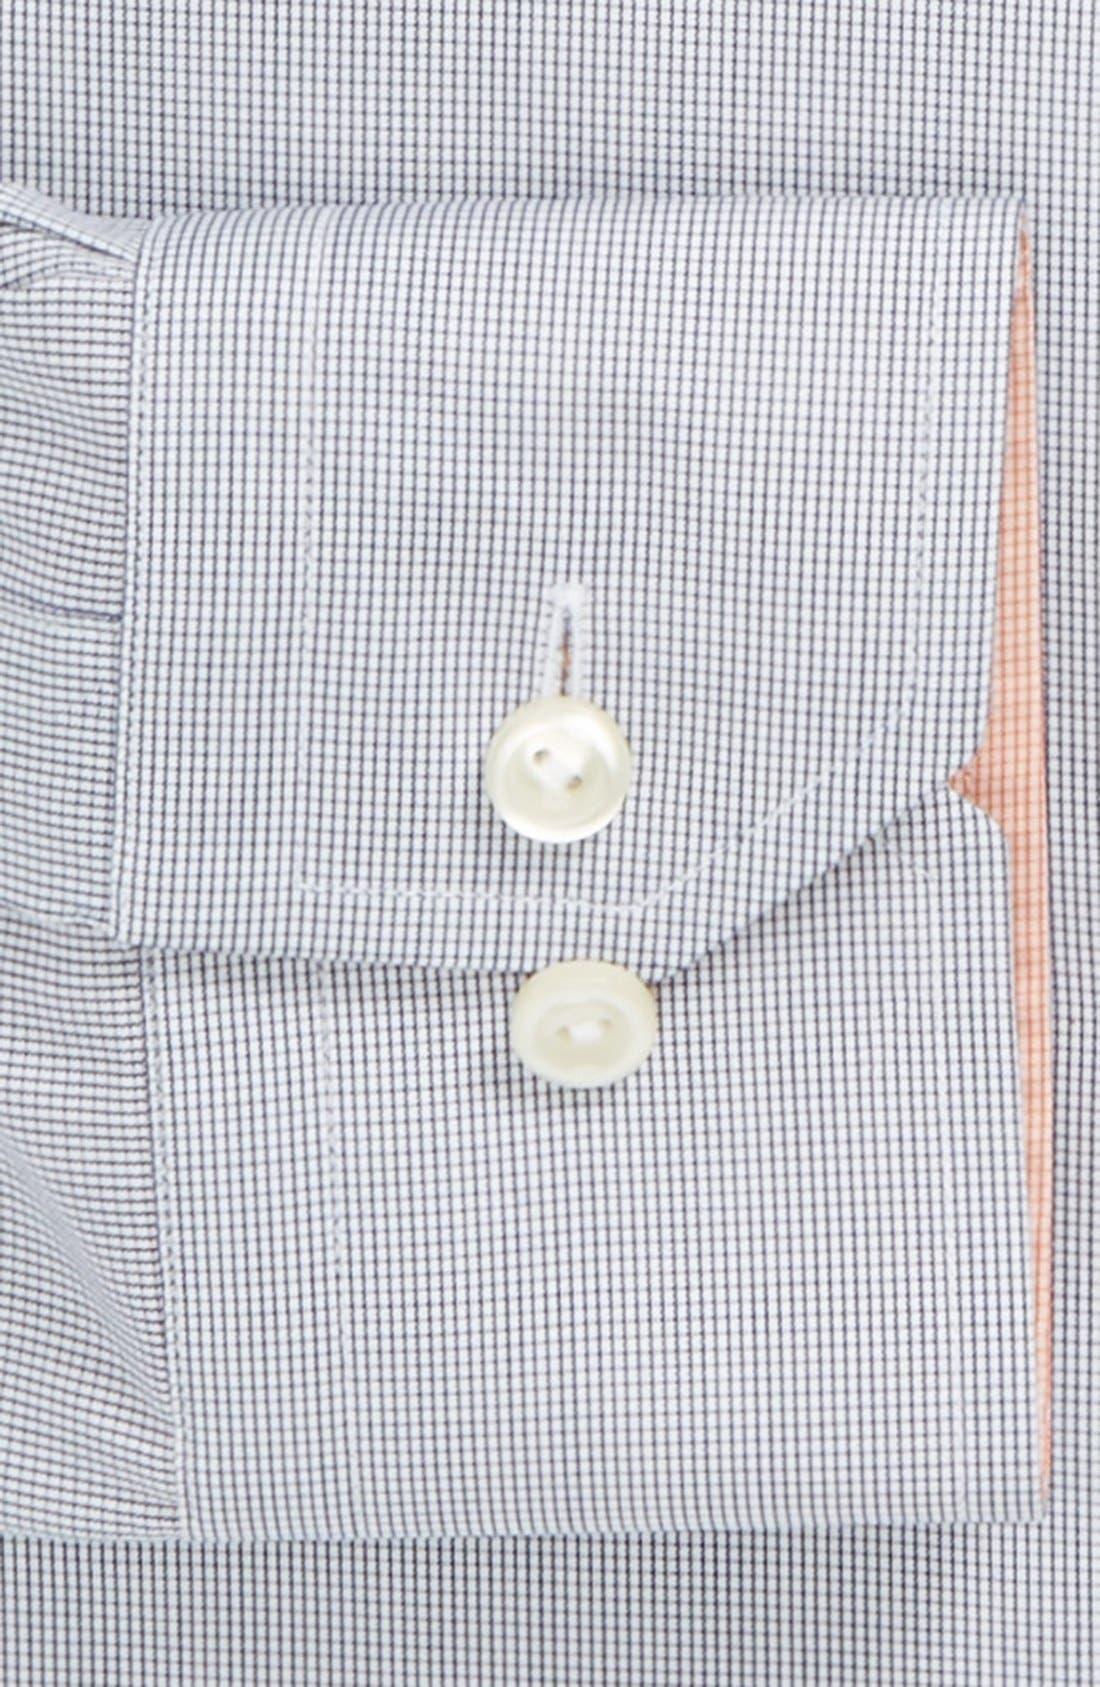 Alternate Image 2  - Eton Slim Fit Non-Iron Dress Shirt